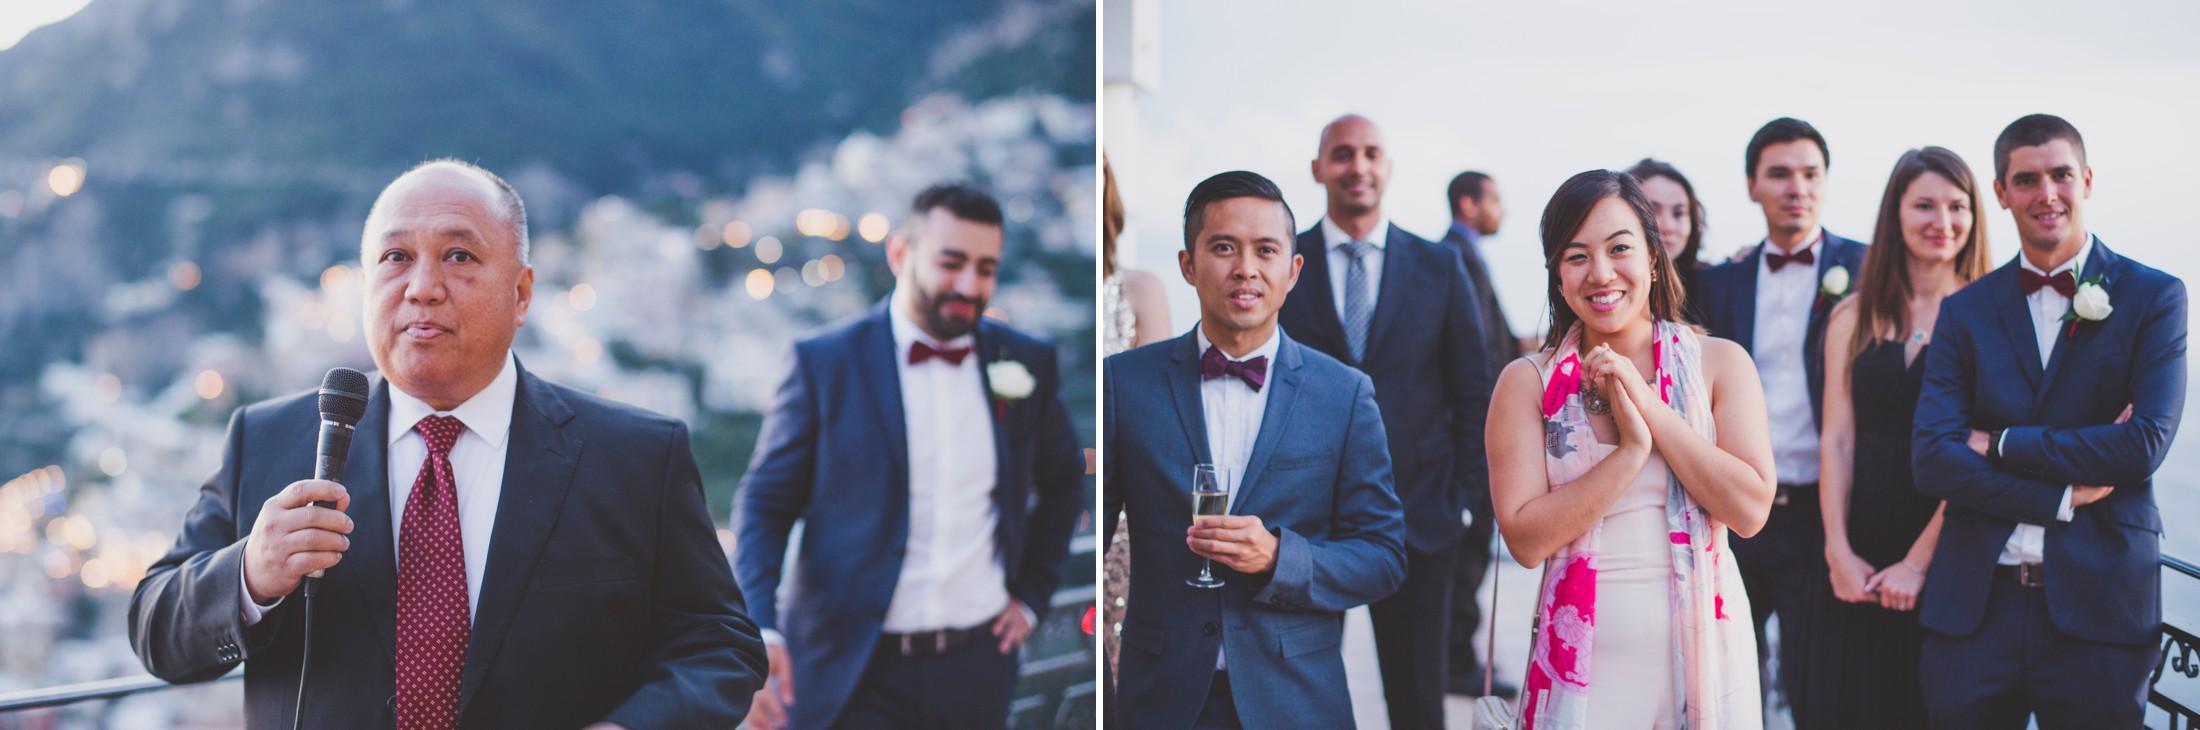 positano wedding guests during a speech